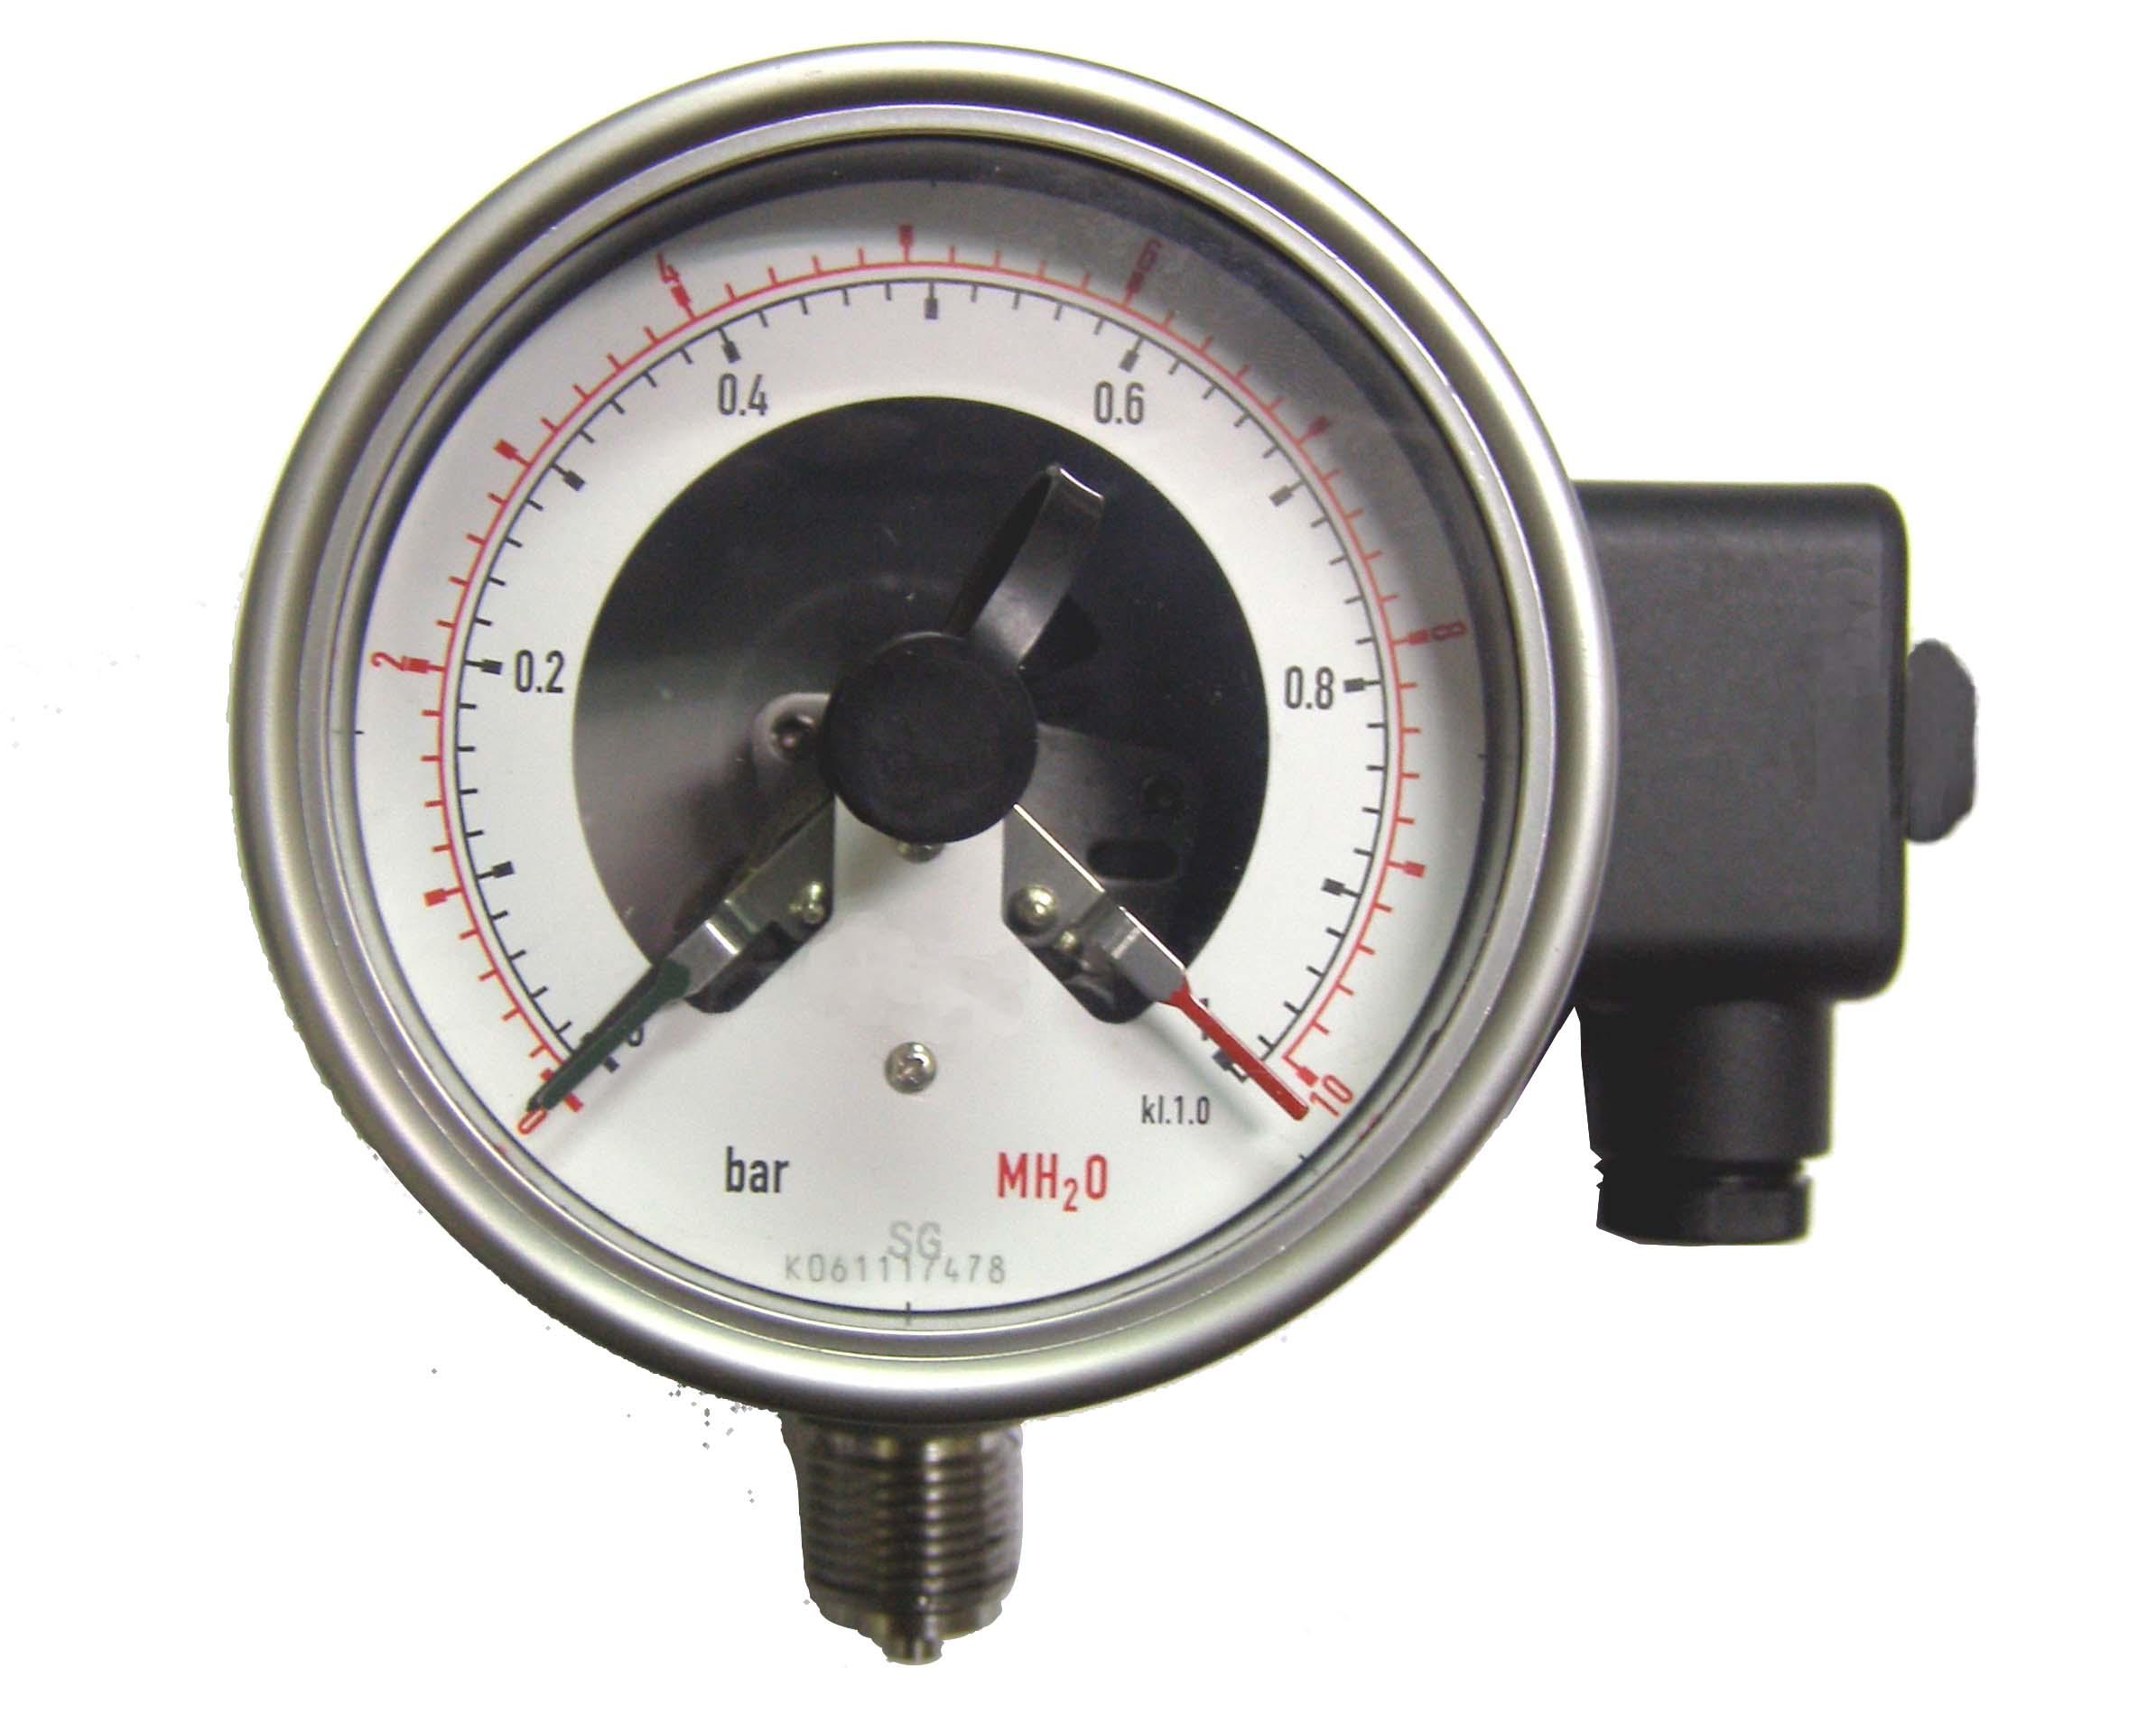 Analog pressure gauges